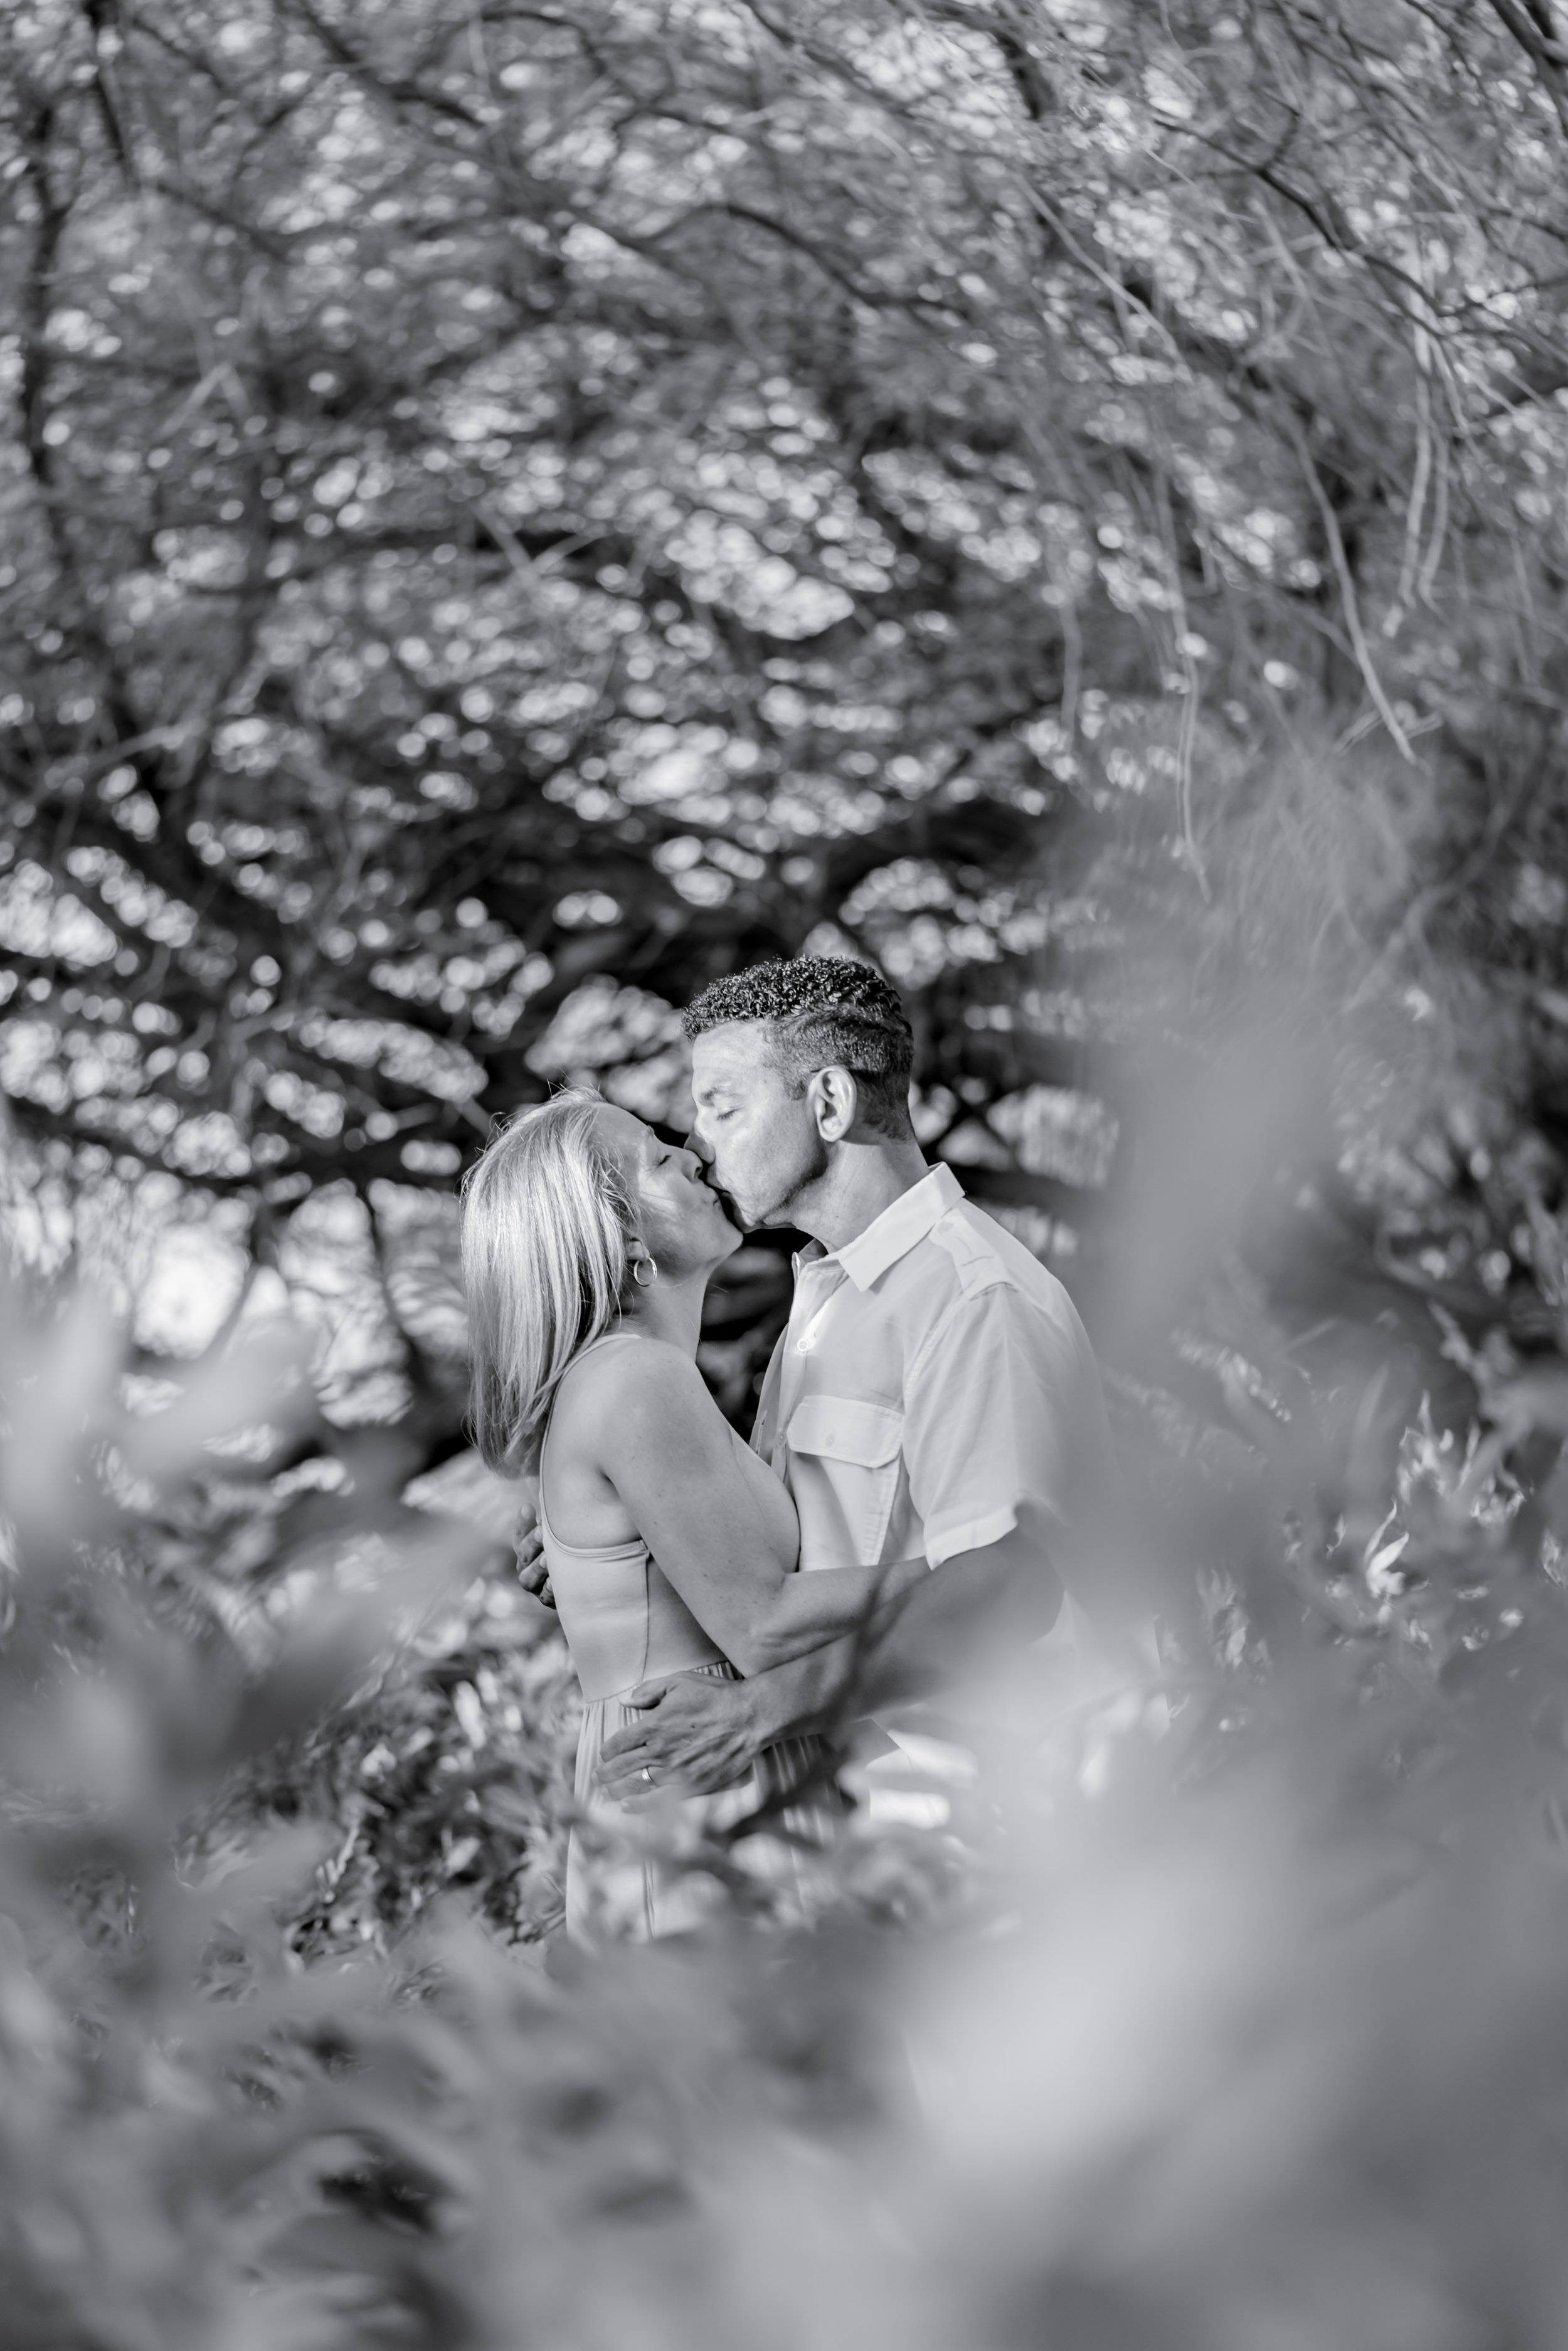 ©2019 Ranae Keane-Bamsey Photography www.EMotionGalleries.com